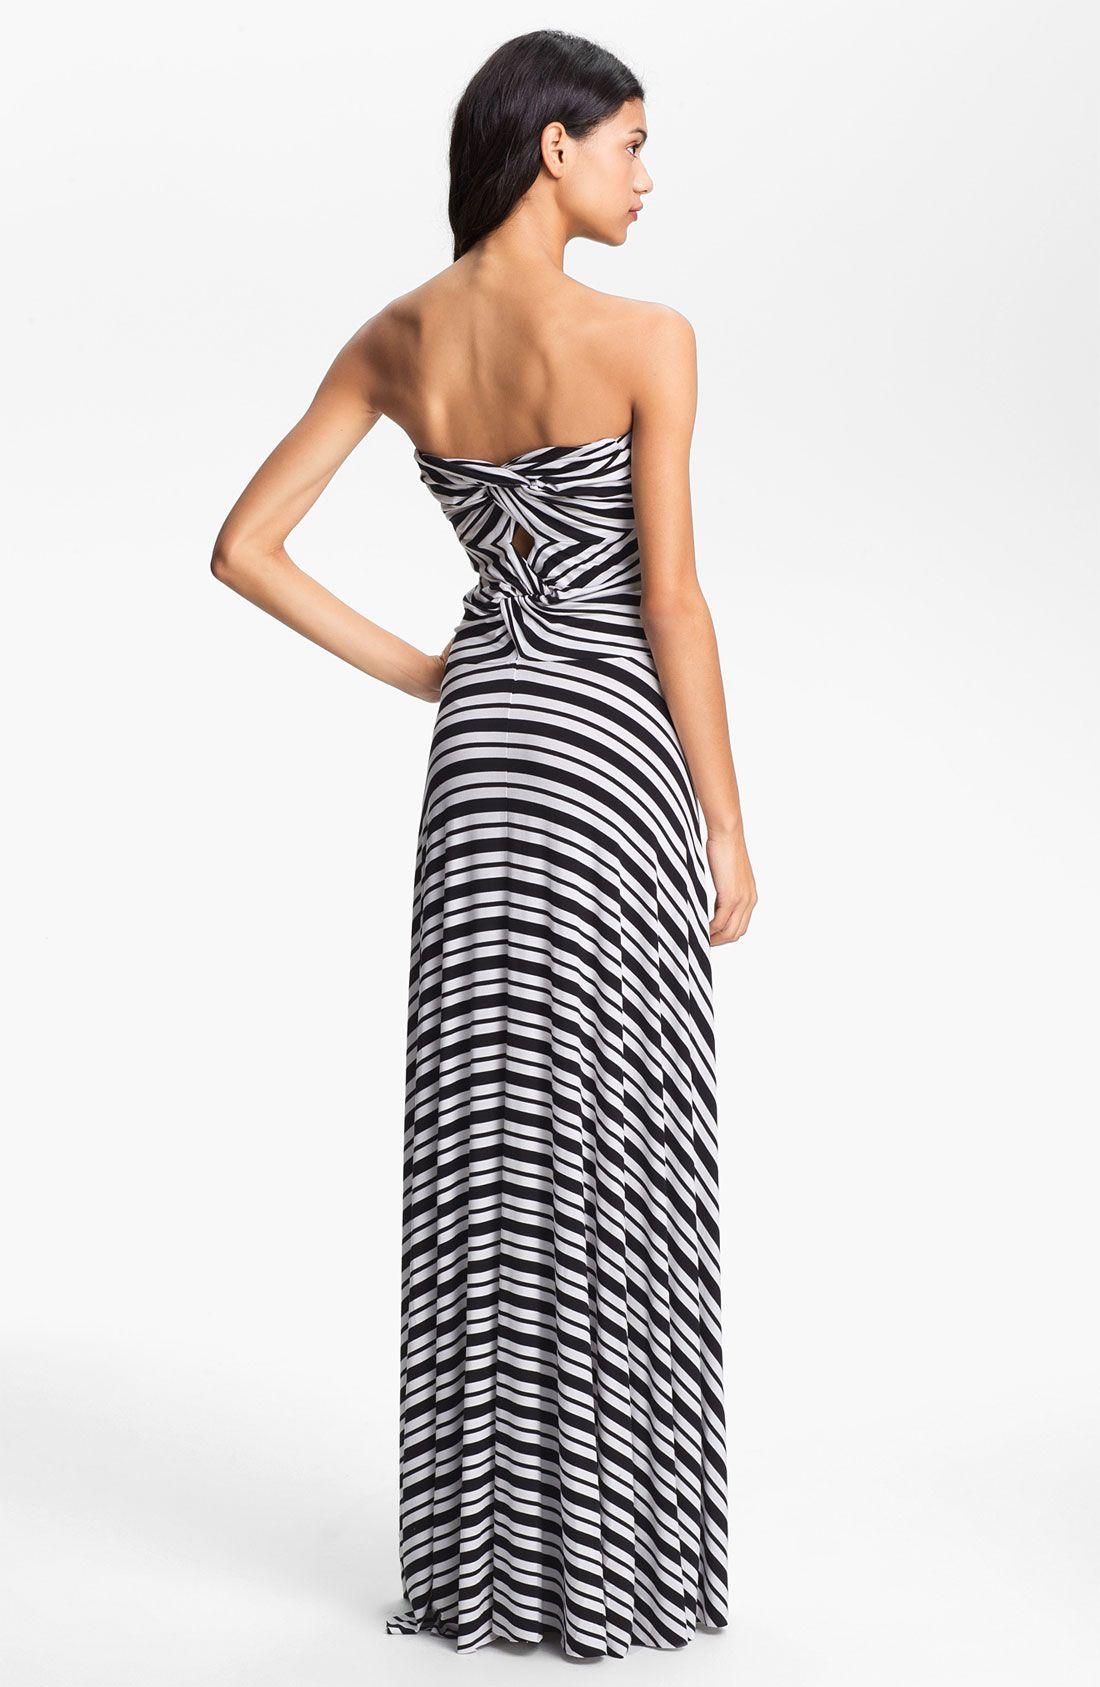 Felicity Coco Stripe Strapless Maxi Dress Nordstrom Exclusive Nordstrom Strapless Maxi Dress Flattering Maxi Dress Style Maxi Dress [ 1687 x 1100 Pixel ]